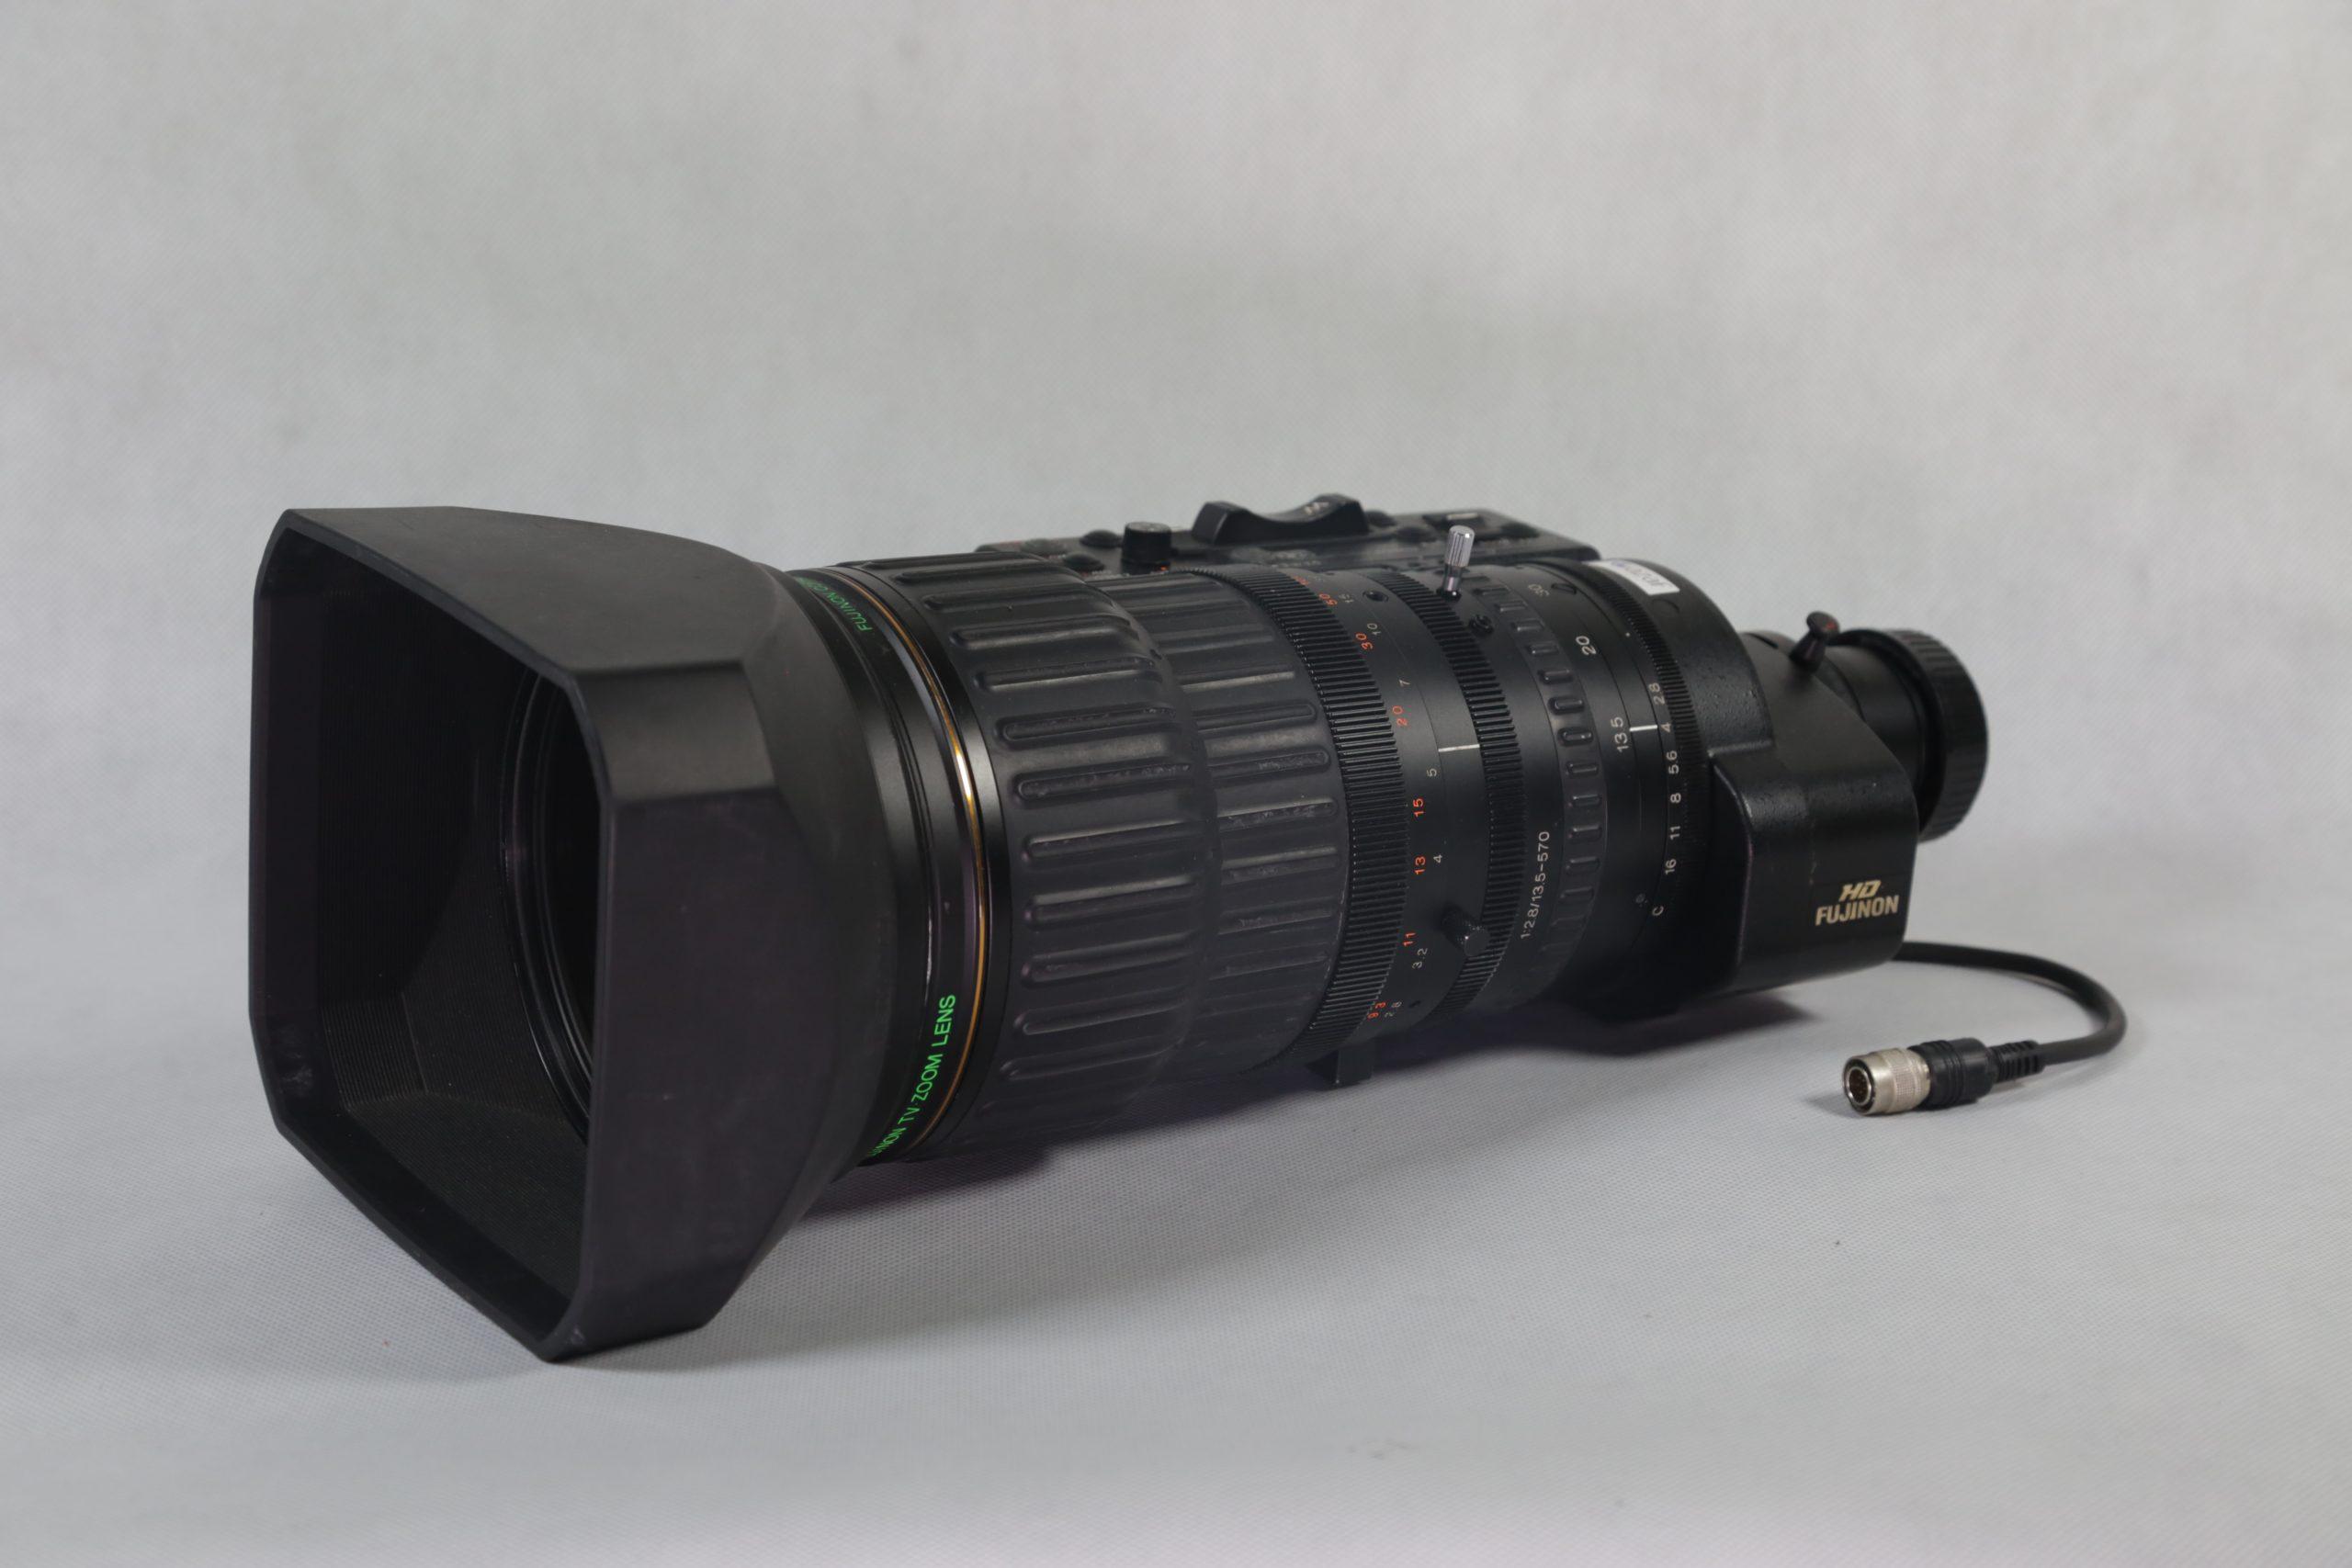 Fujinon HA42x13.5 BERD - U48